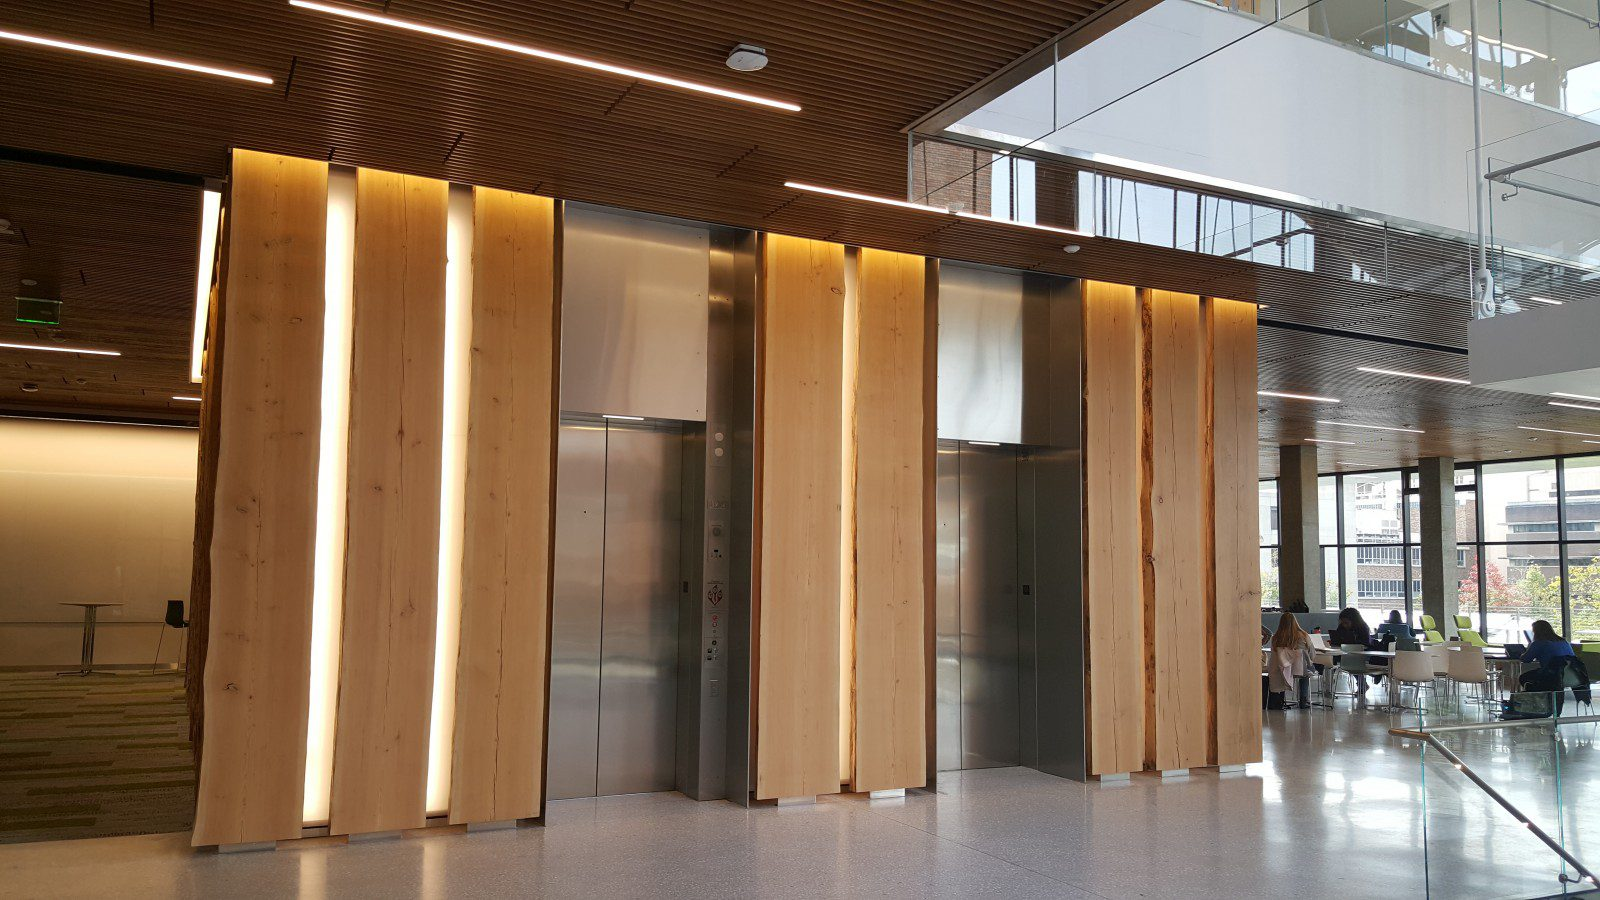 University of Washington Life Sciences Building Elevators_01